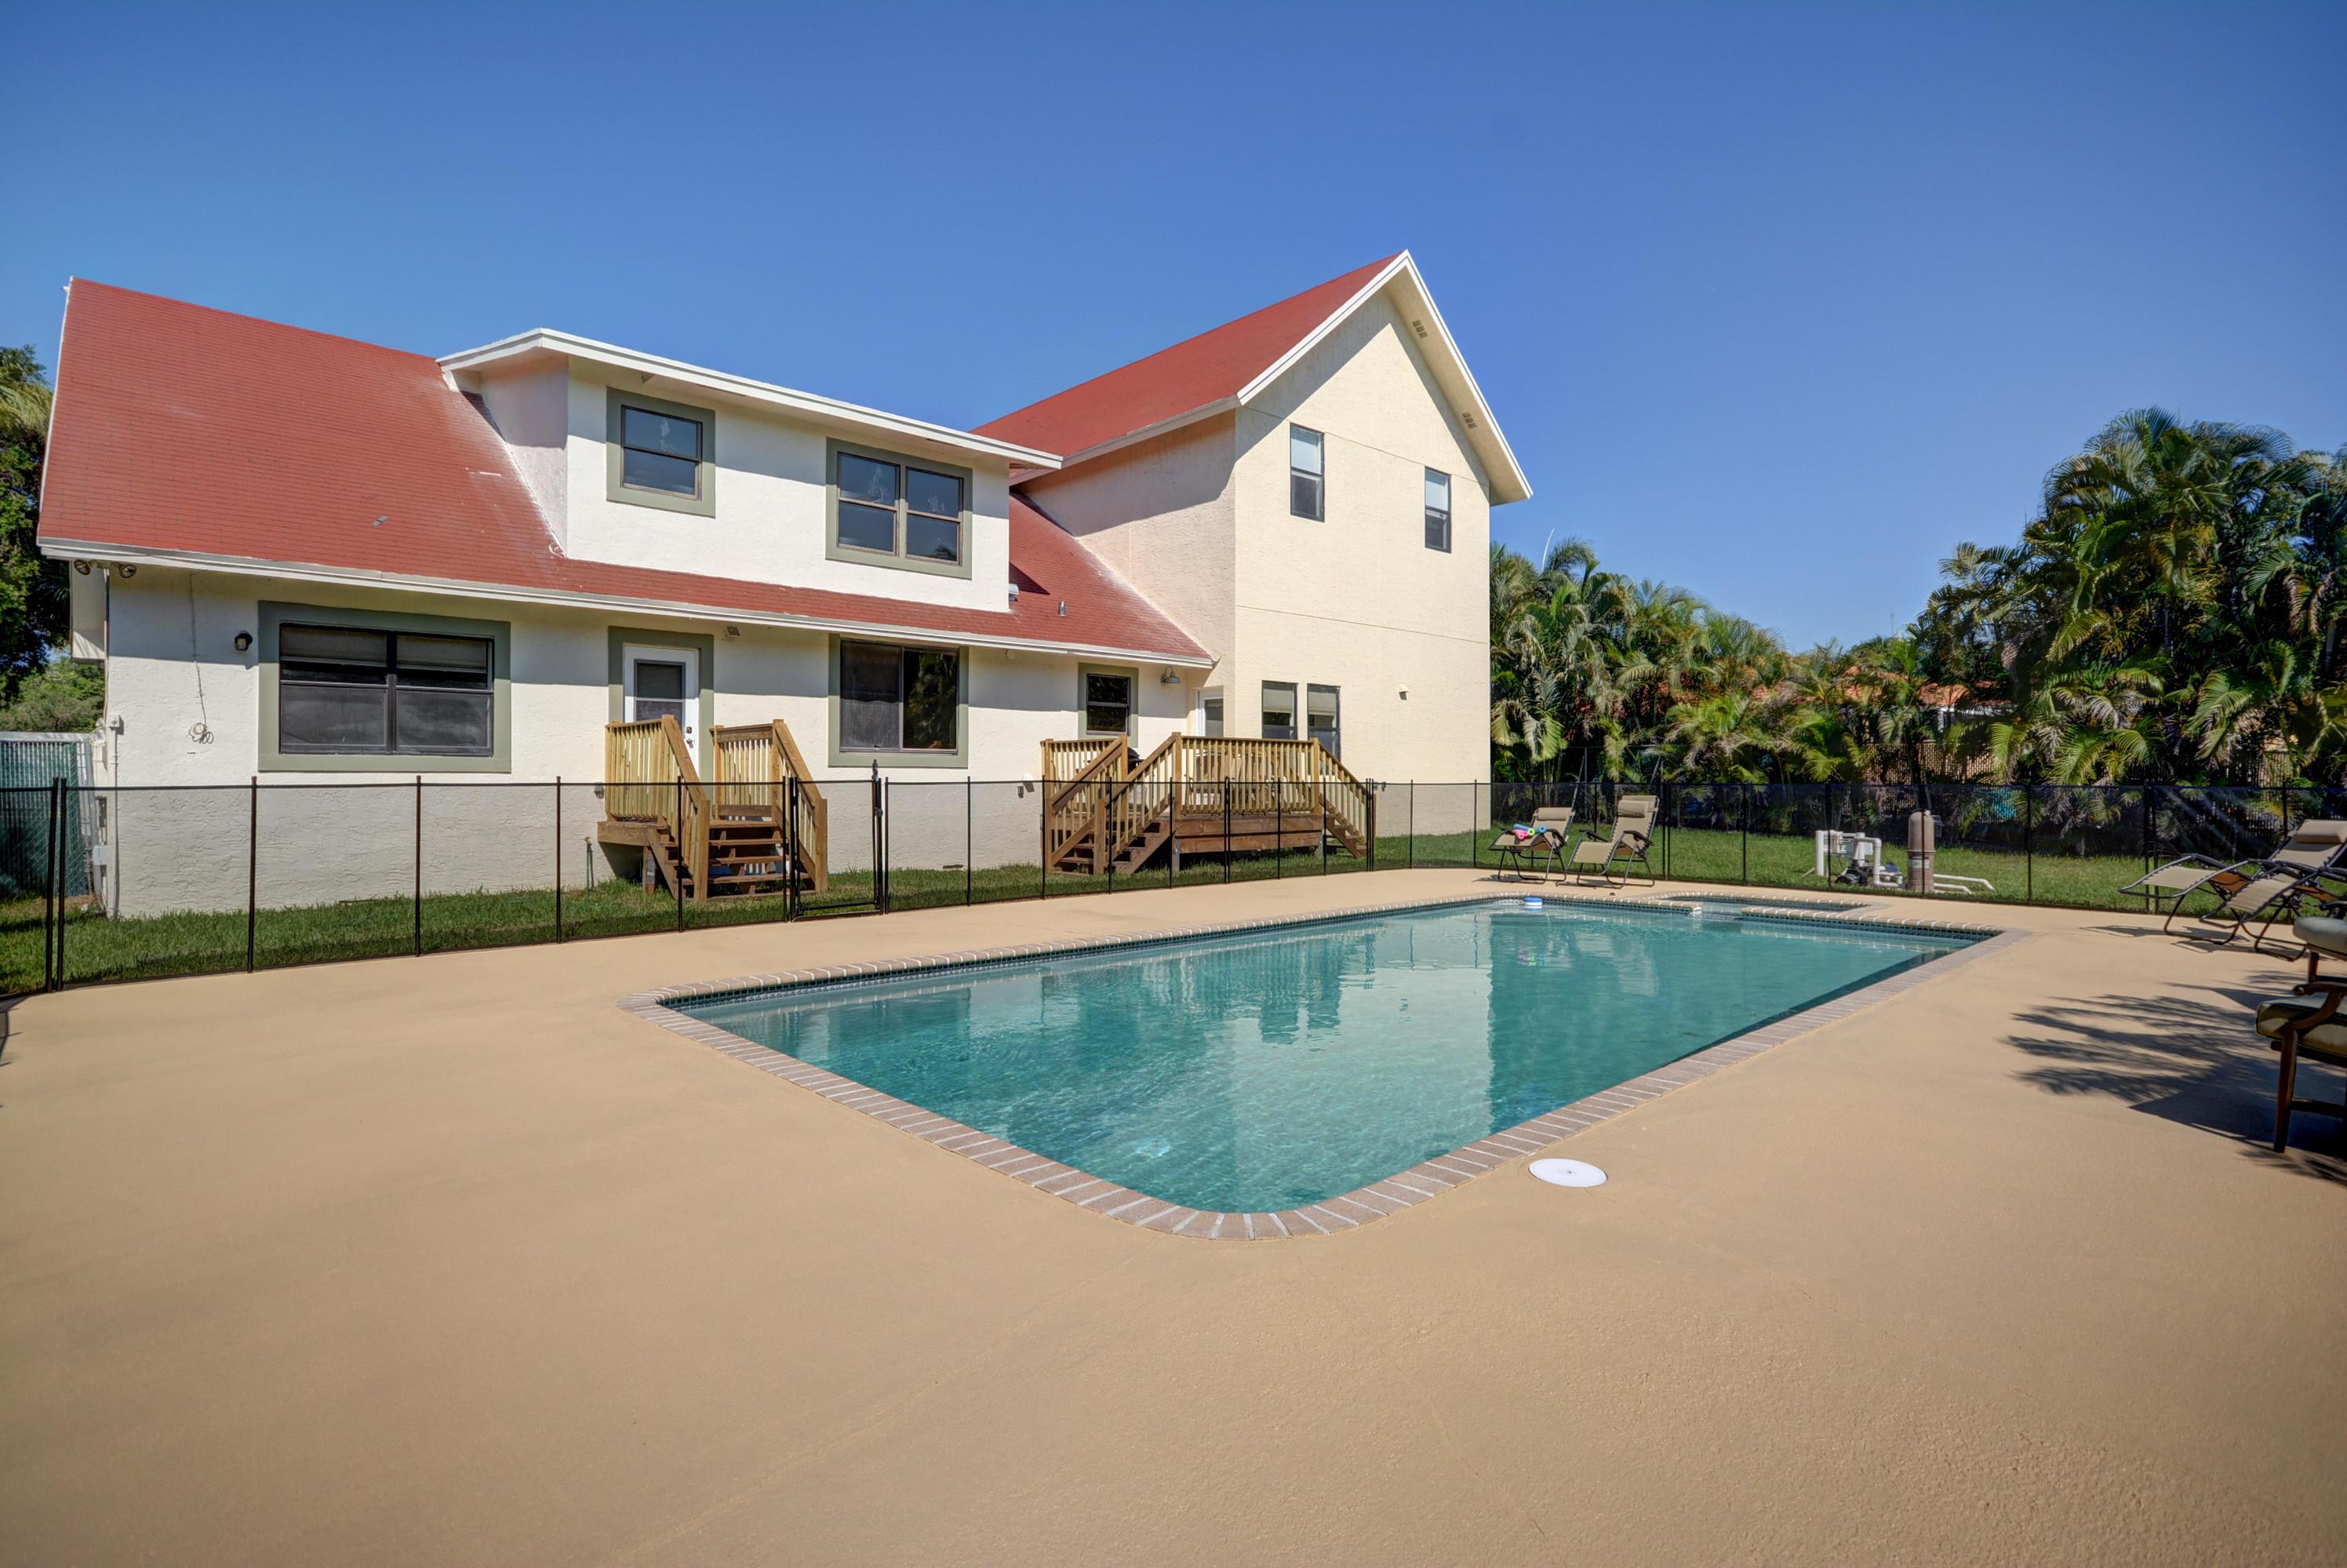 3855 NW 5th Avenue - Boca Raton, Florida